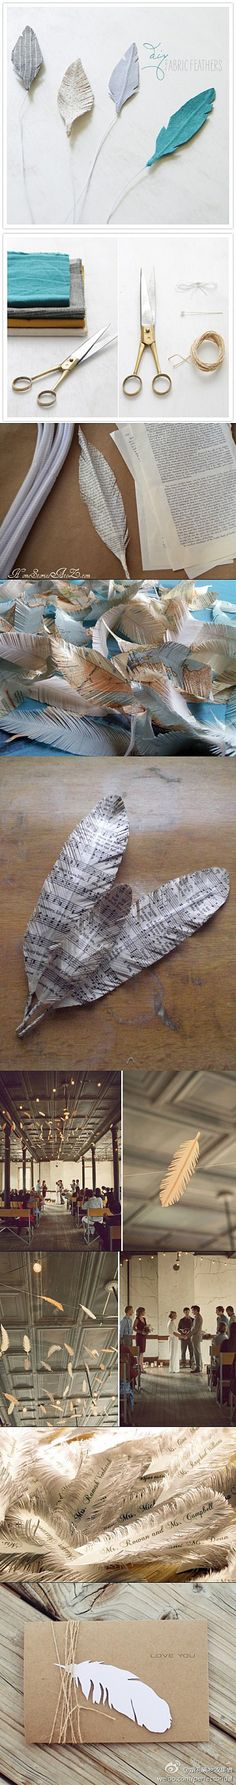 Paper feathers, fabric feathers    Plumas de papel y tela